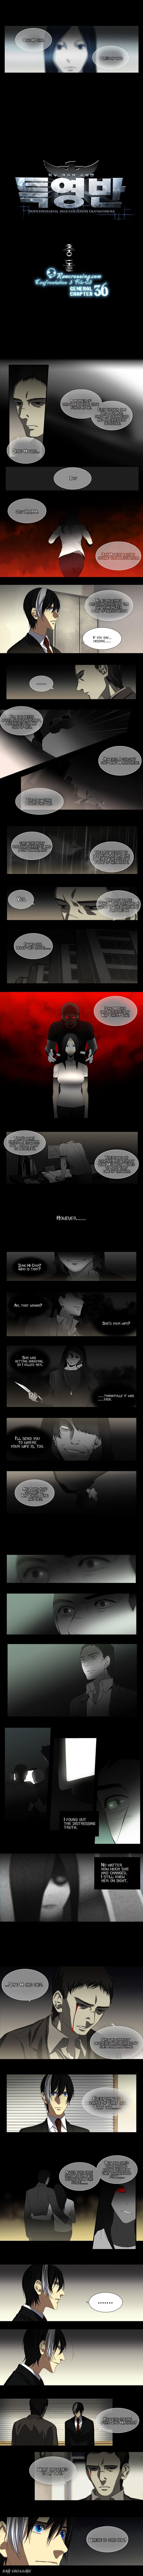 Supernatural Investigation Department 36 Page 2